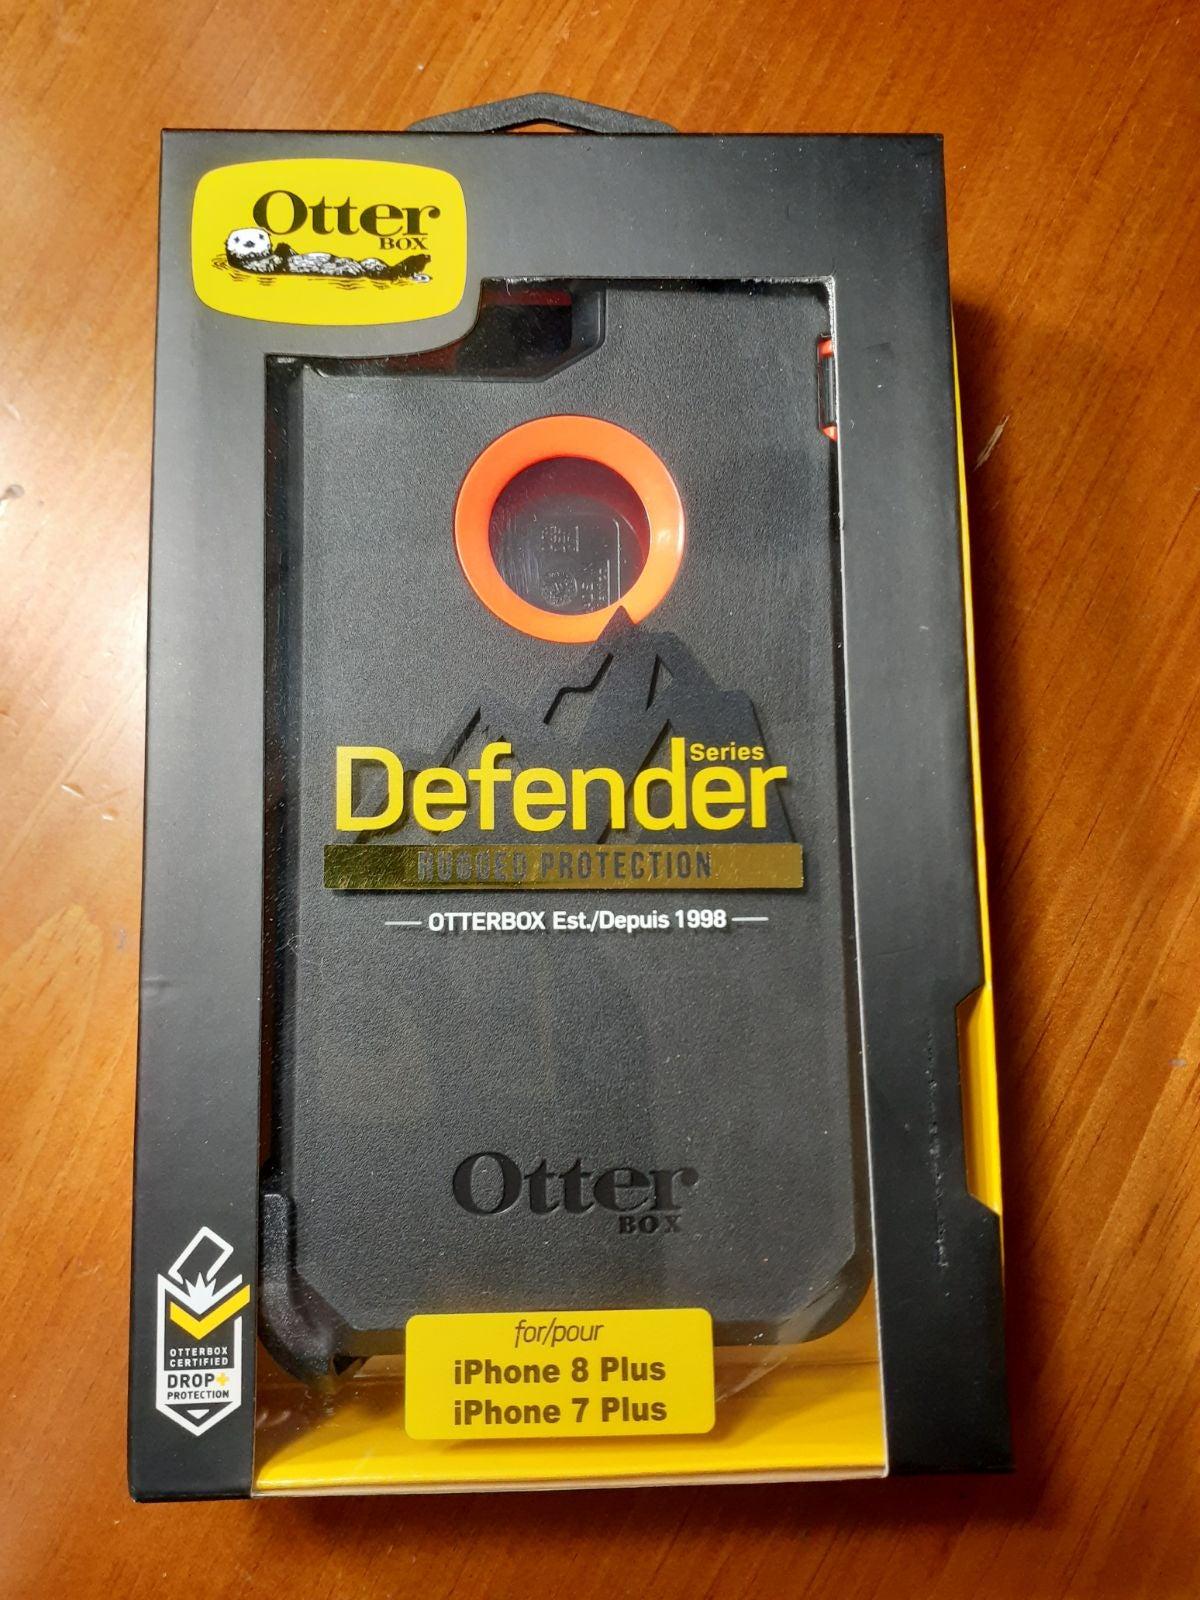 Otterbox defender case for iPhone 7plus